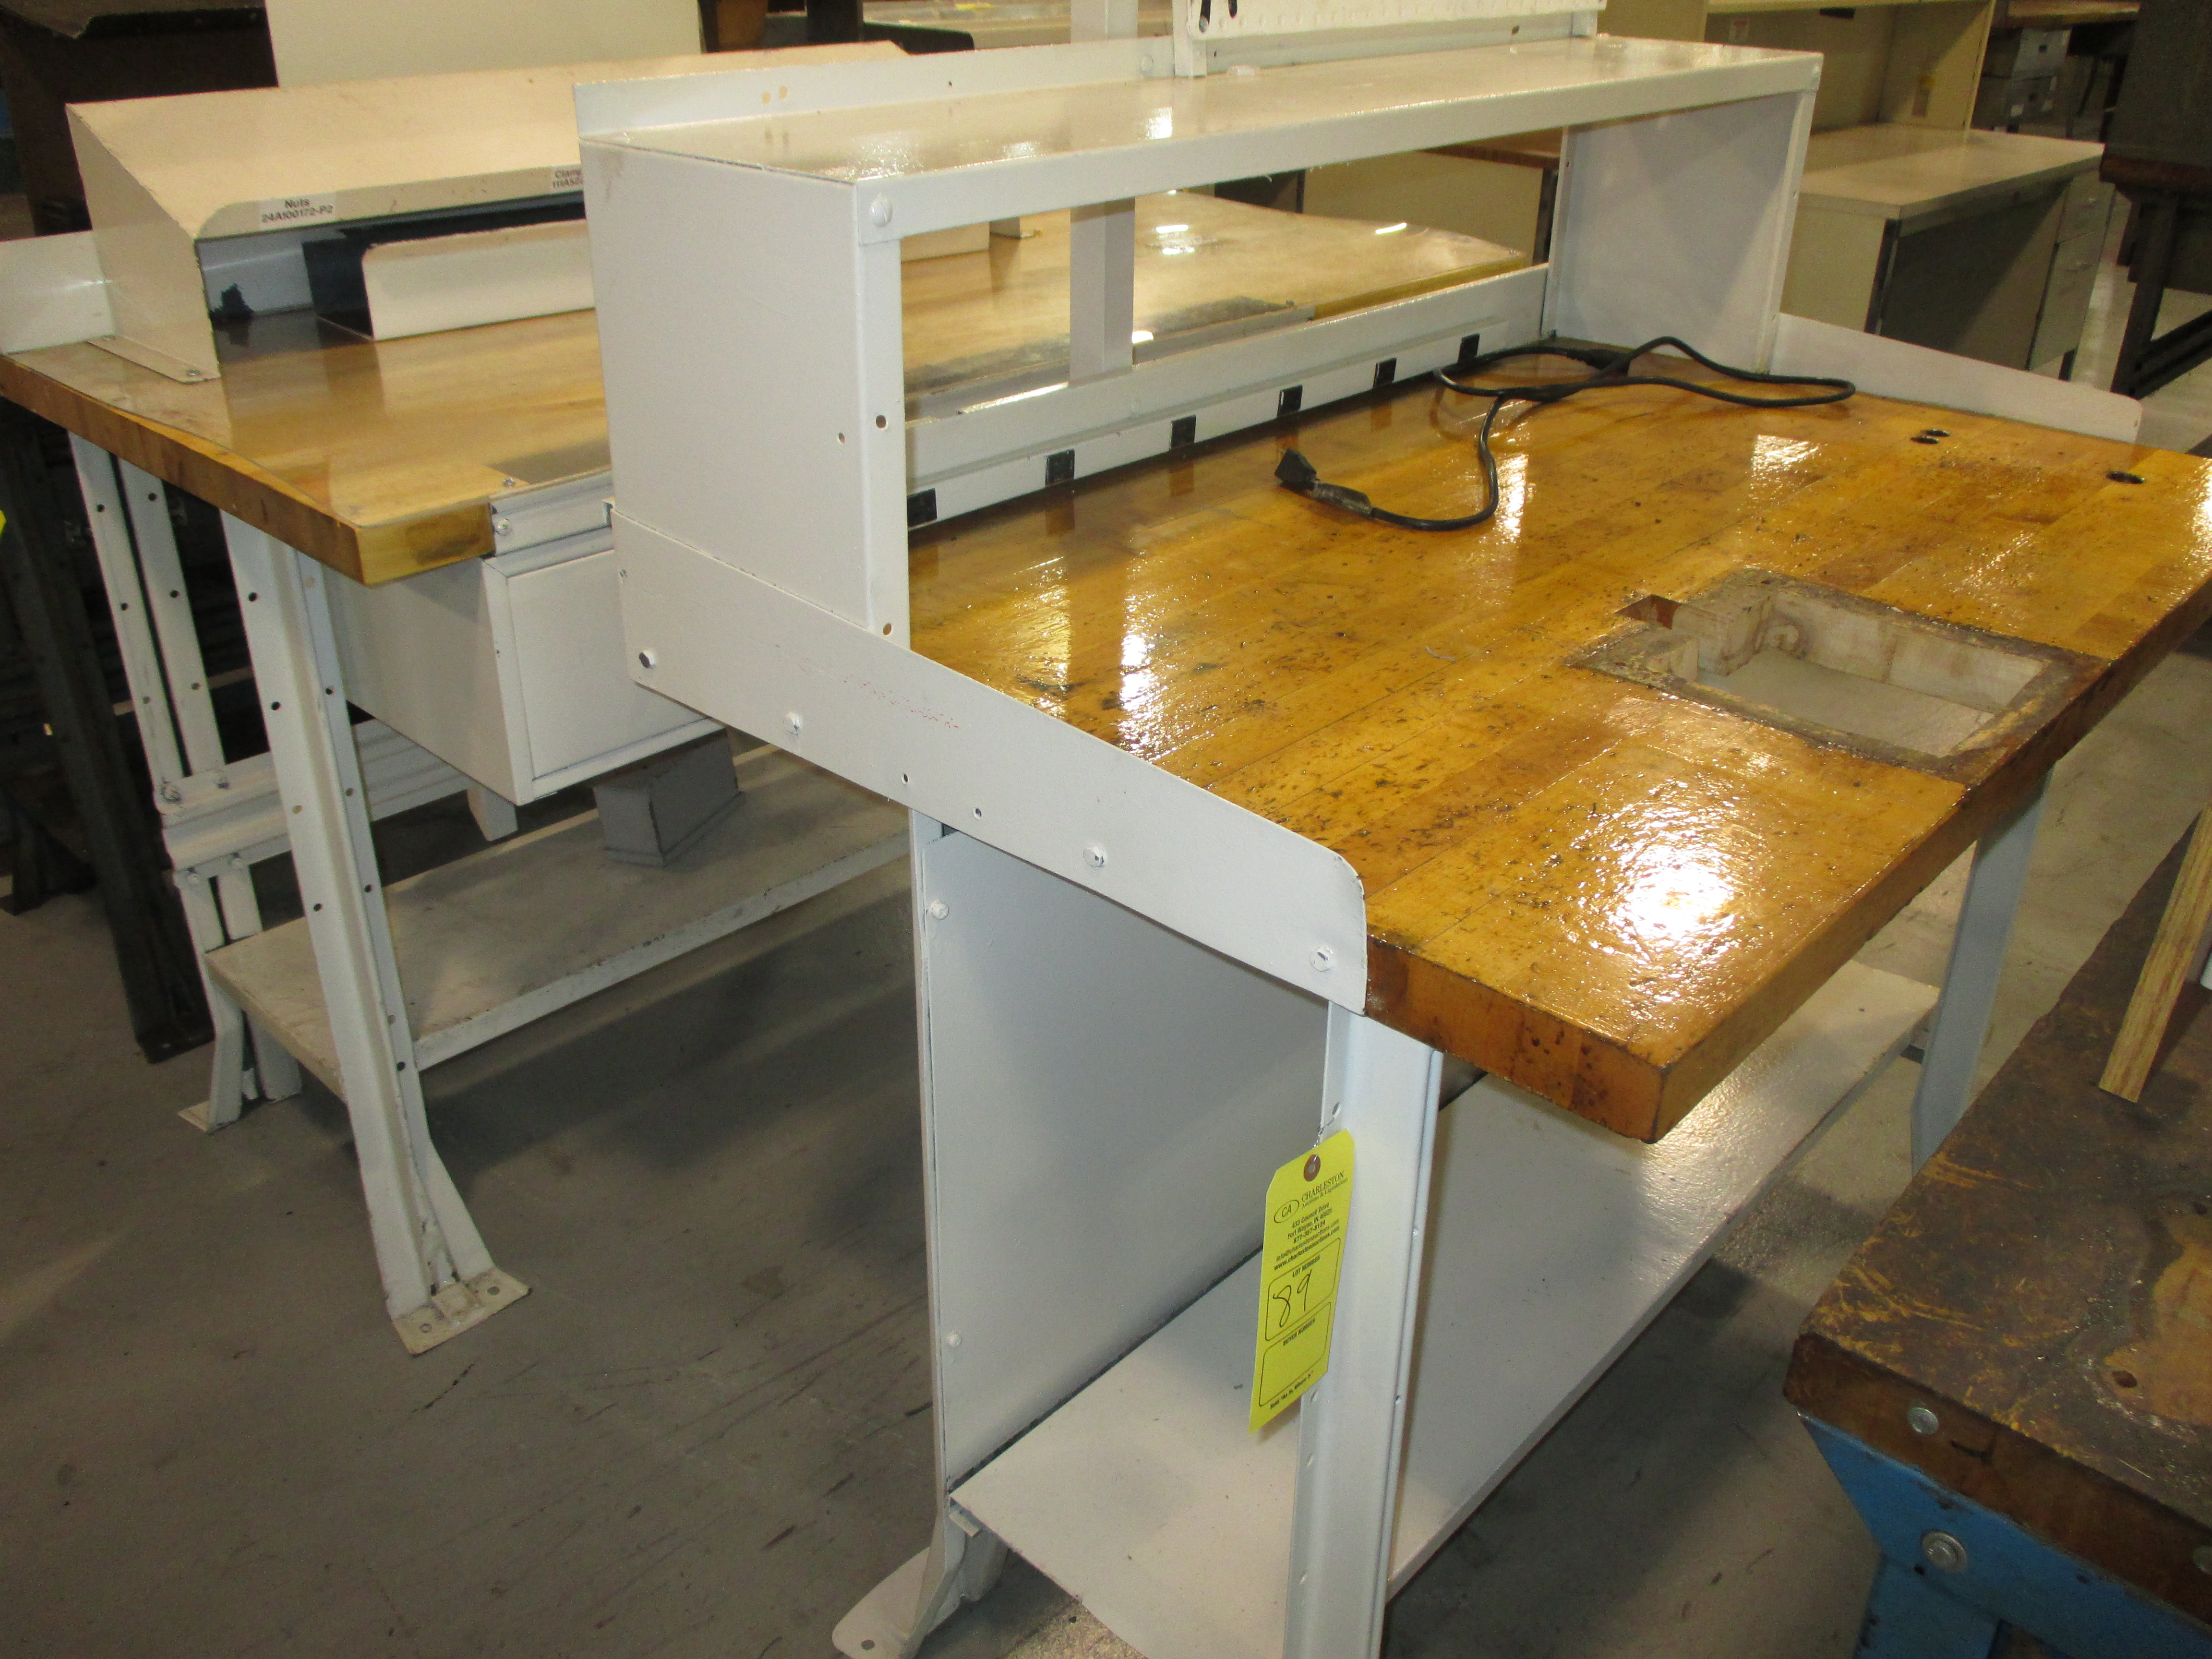 2 butcher block work benches